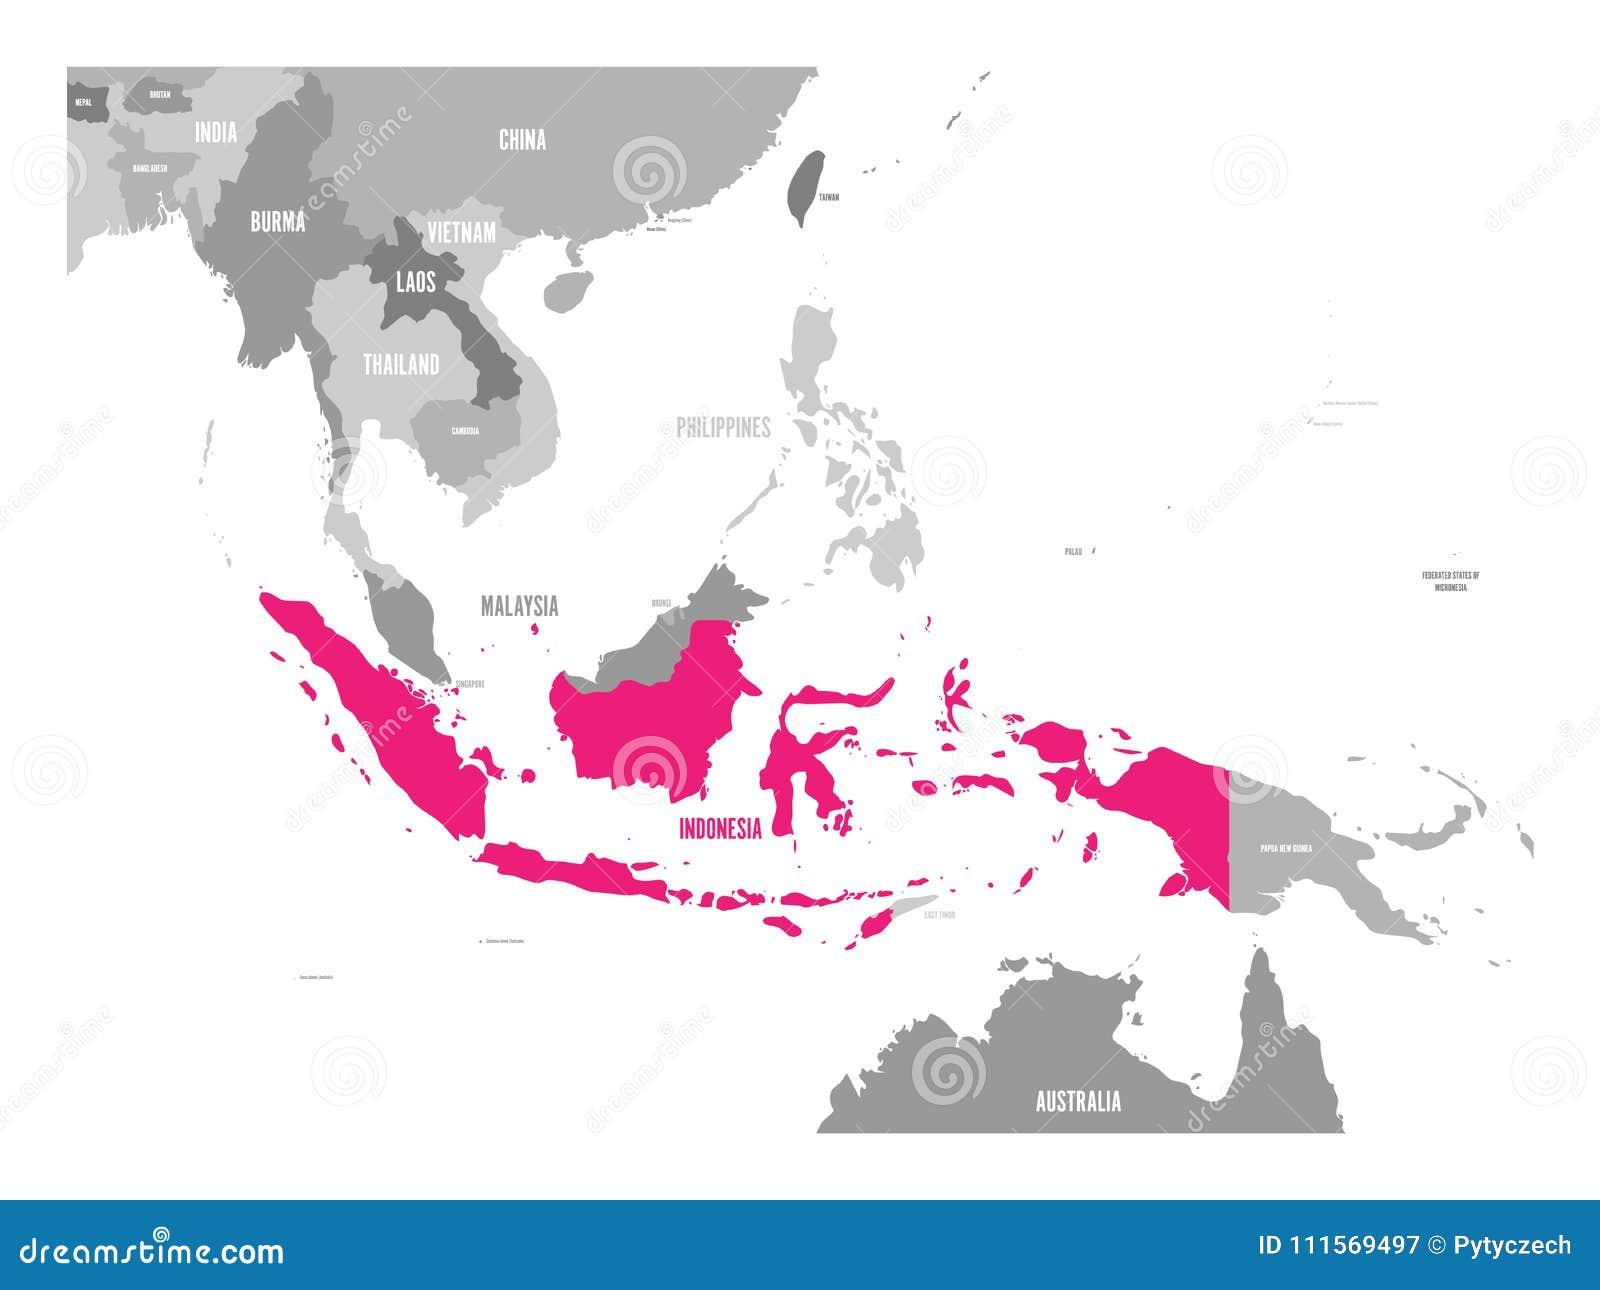 Carte Asie Indonesie.Vecteur De Carte De L Indonesie Rose Accentue Dans La Region